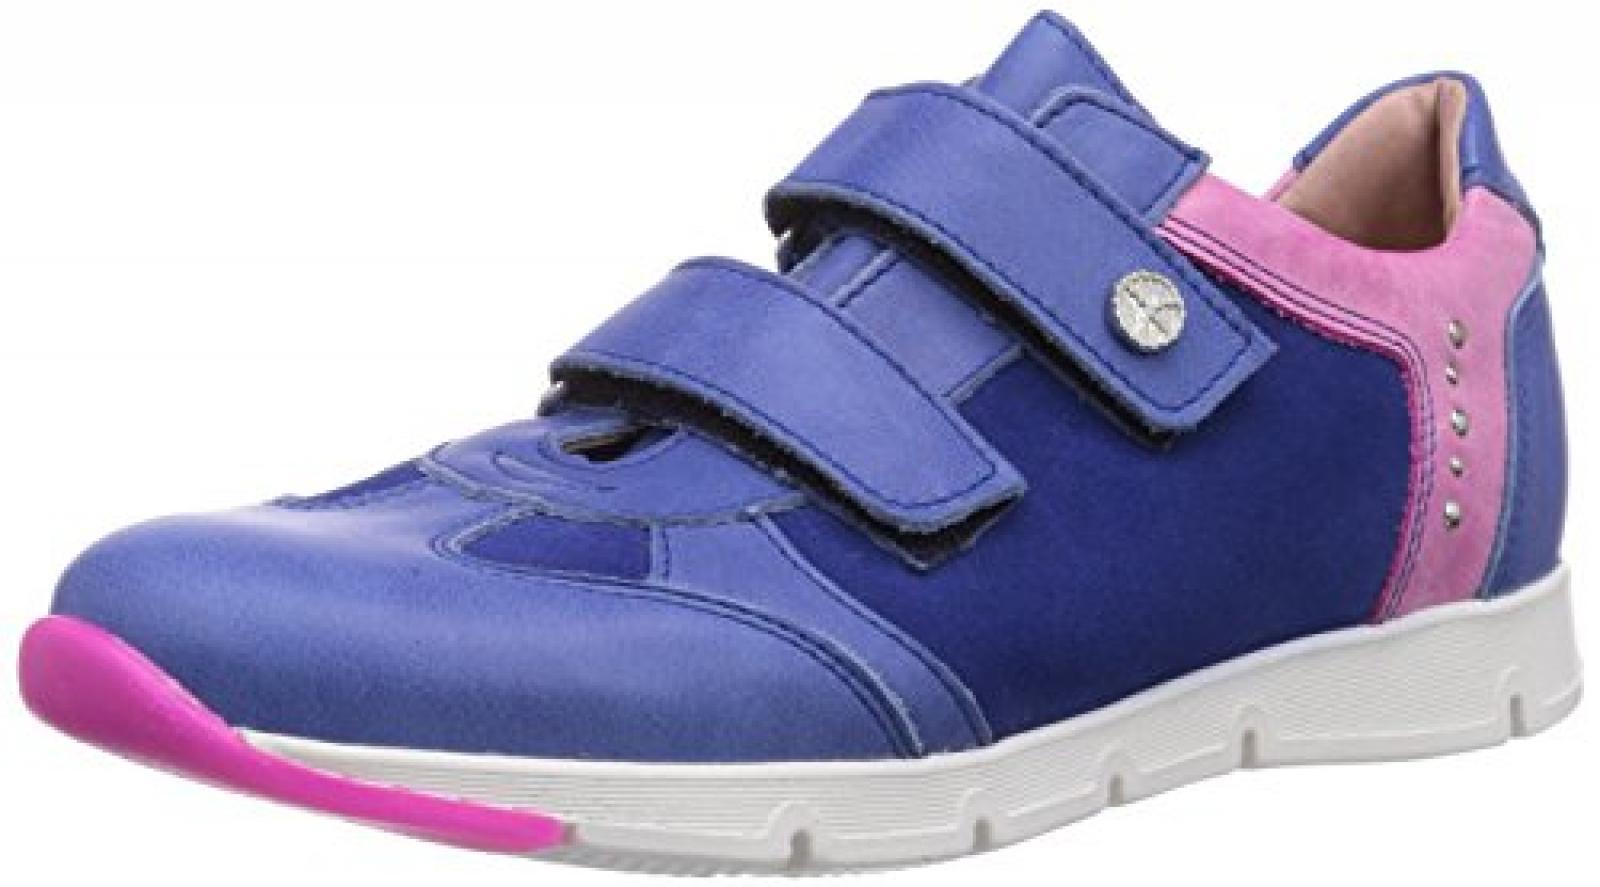 Däumling Jana-Julia Mädchen Sneakers